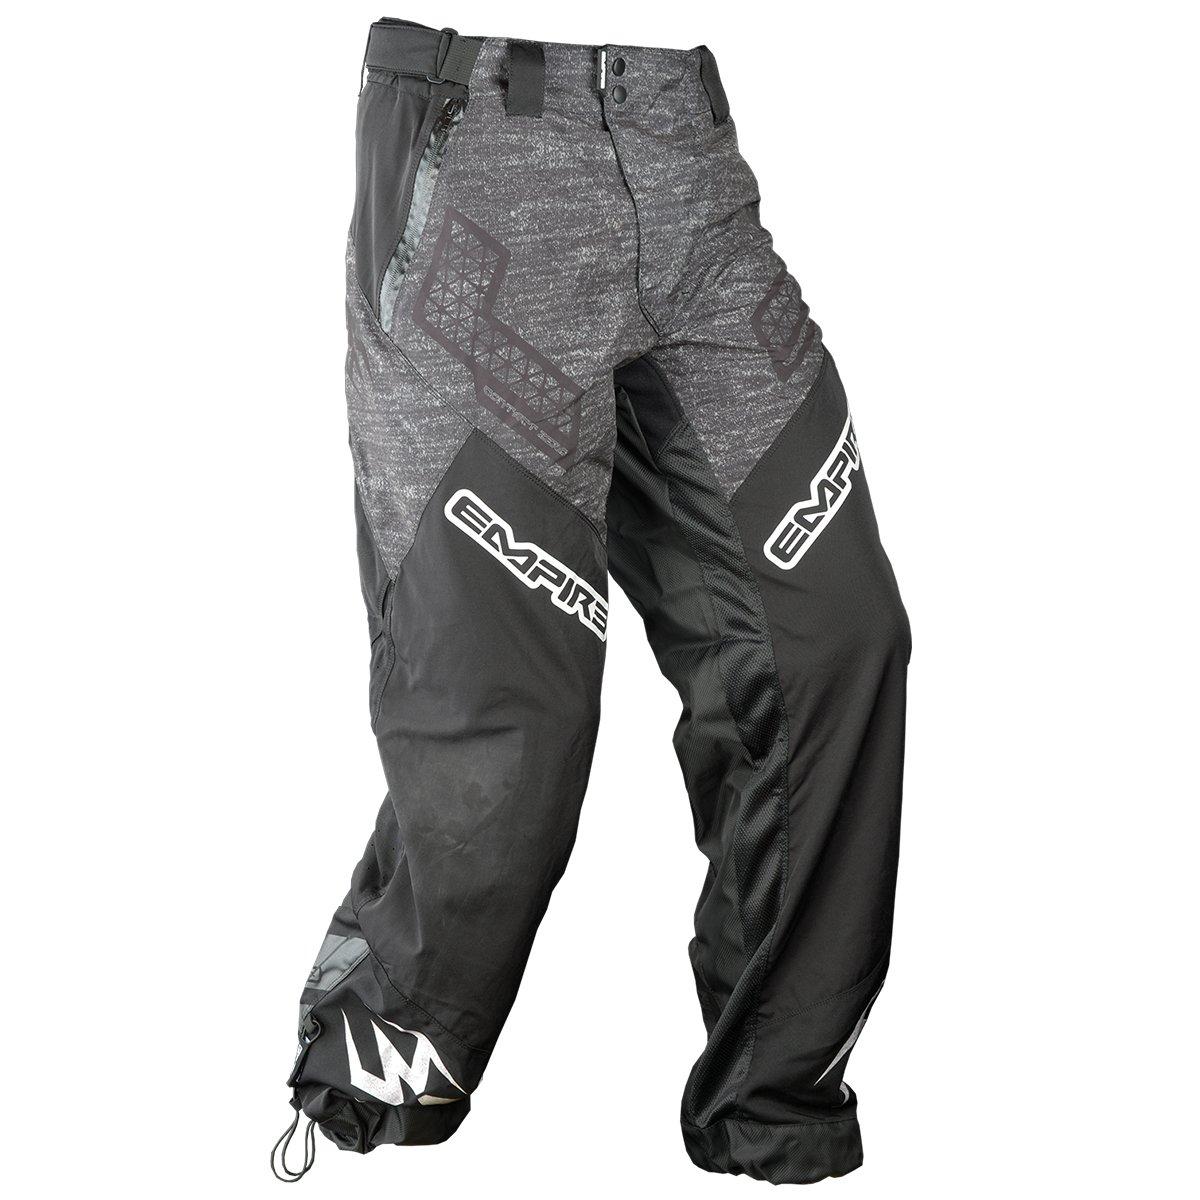 Empire Contact Zero F7 Paintball Pants Black (3X-Large)